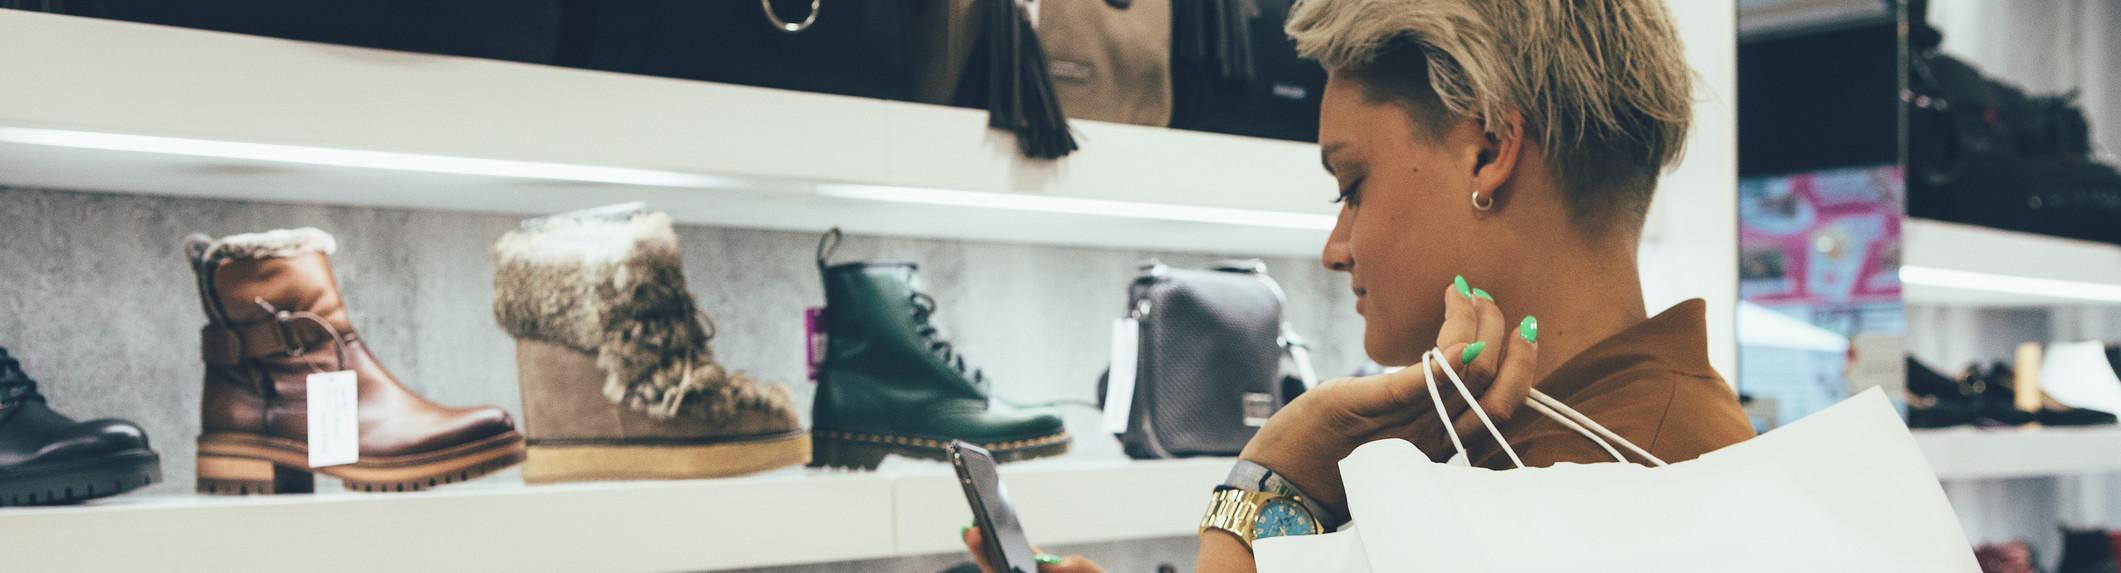 woman checking shoe price